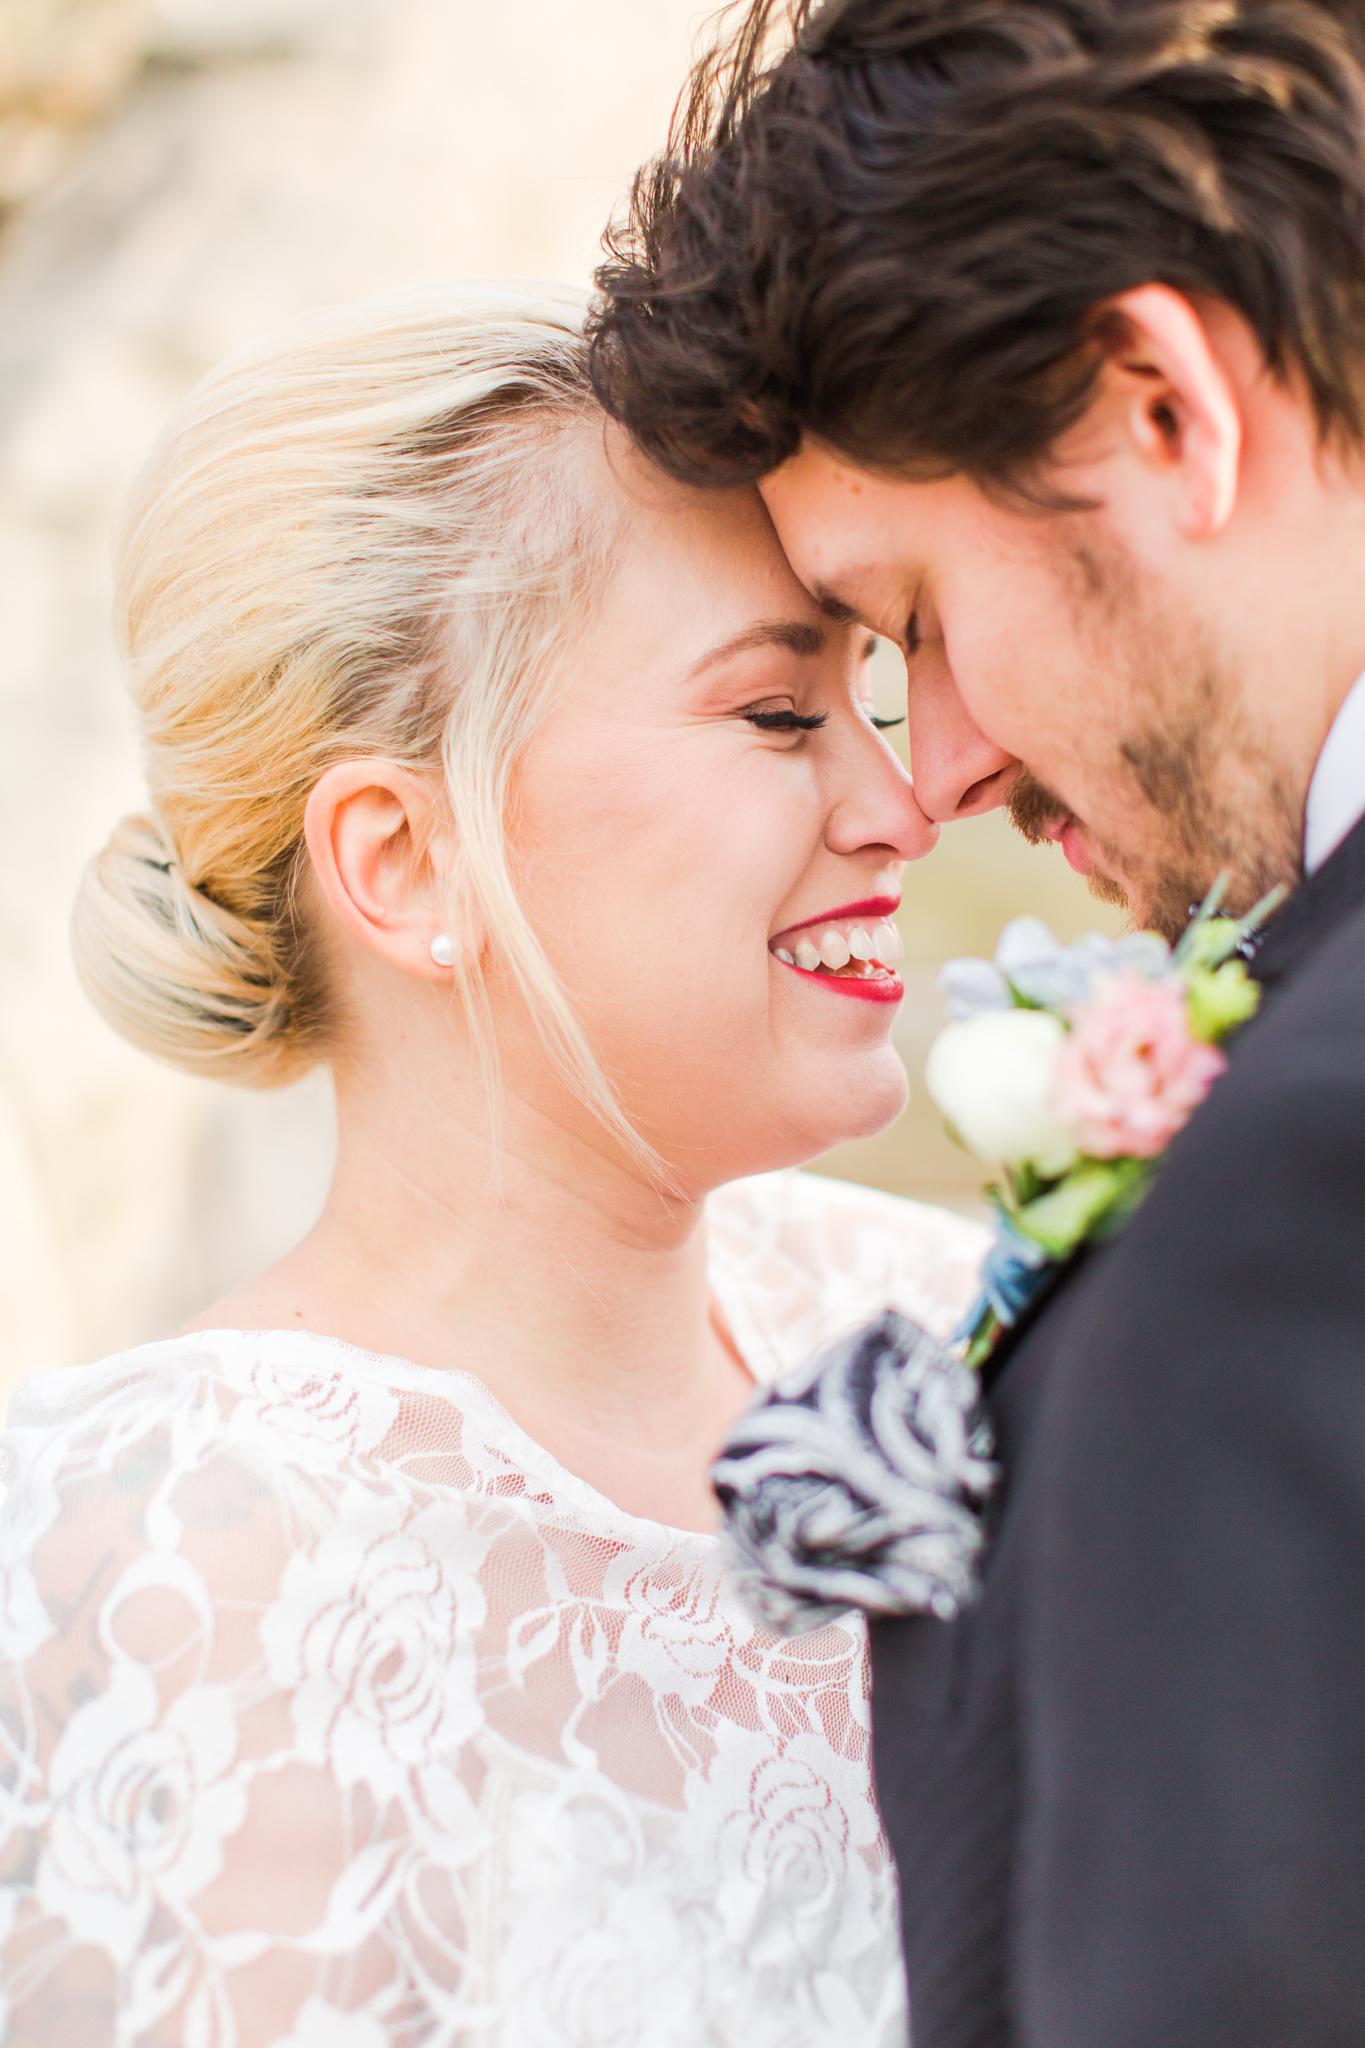 Haley Mansion Winter Wedding - Shaina Lee Photography-305.jpg